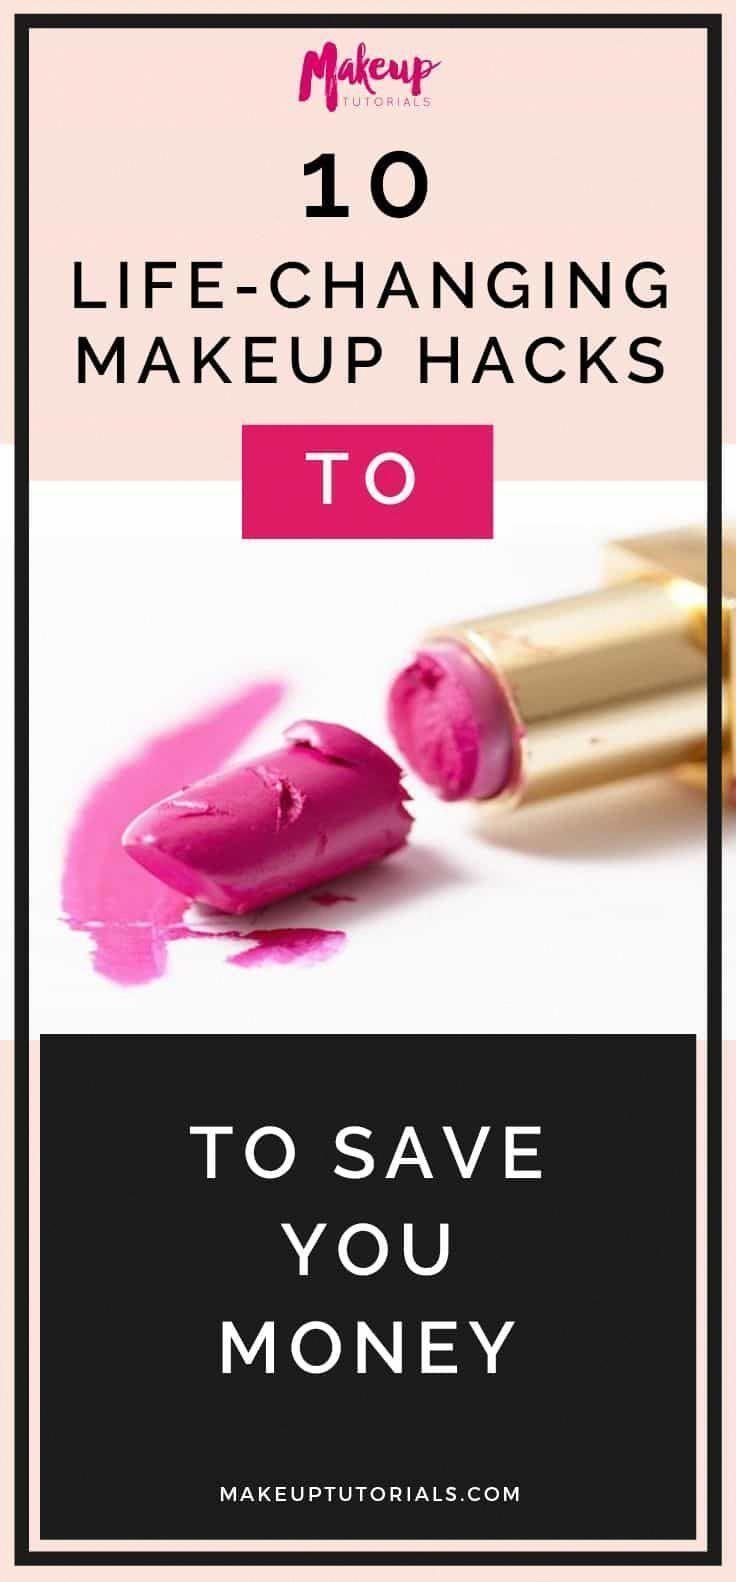 Atemberaubende Make-up-Tools für Anfänger #Makeup-Tools für Anfänger #Anfän…